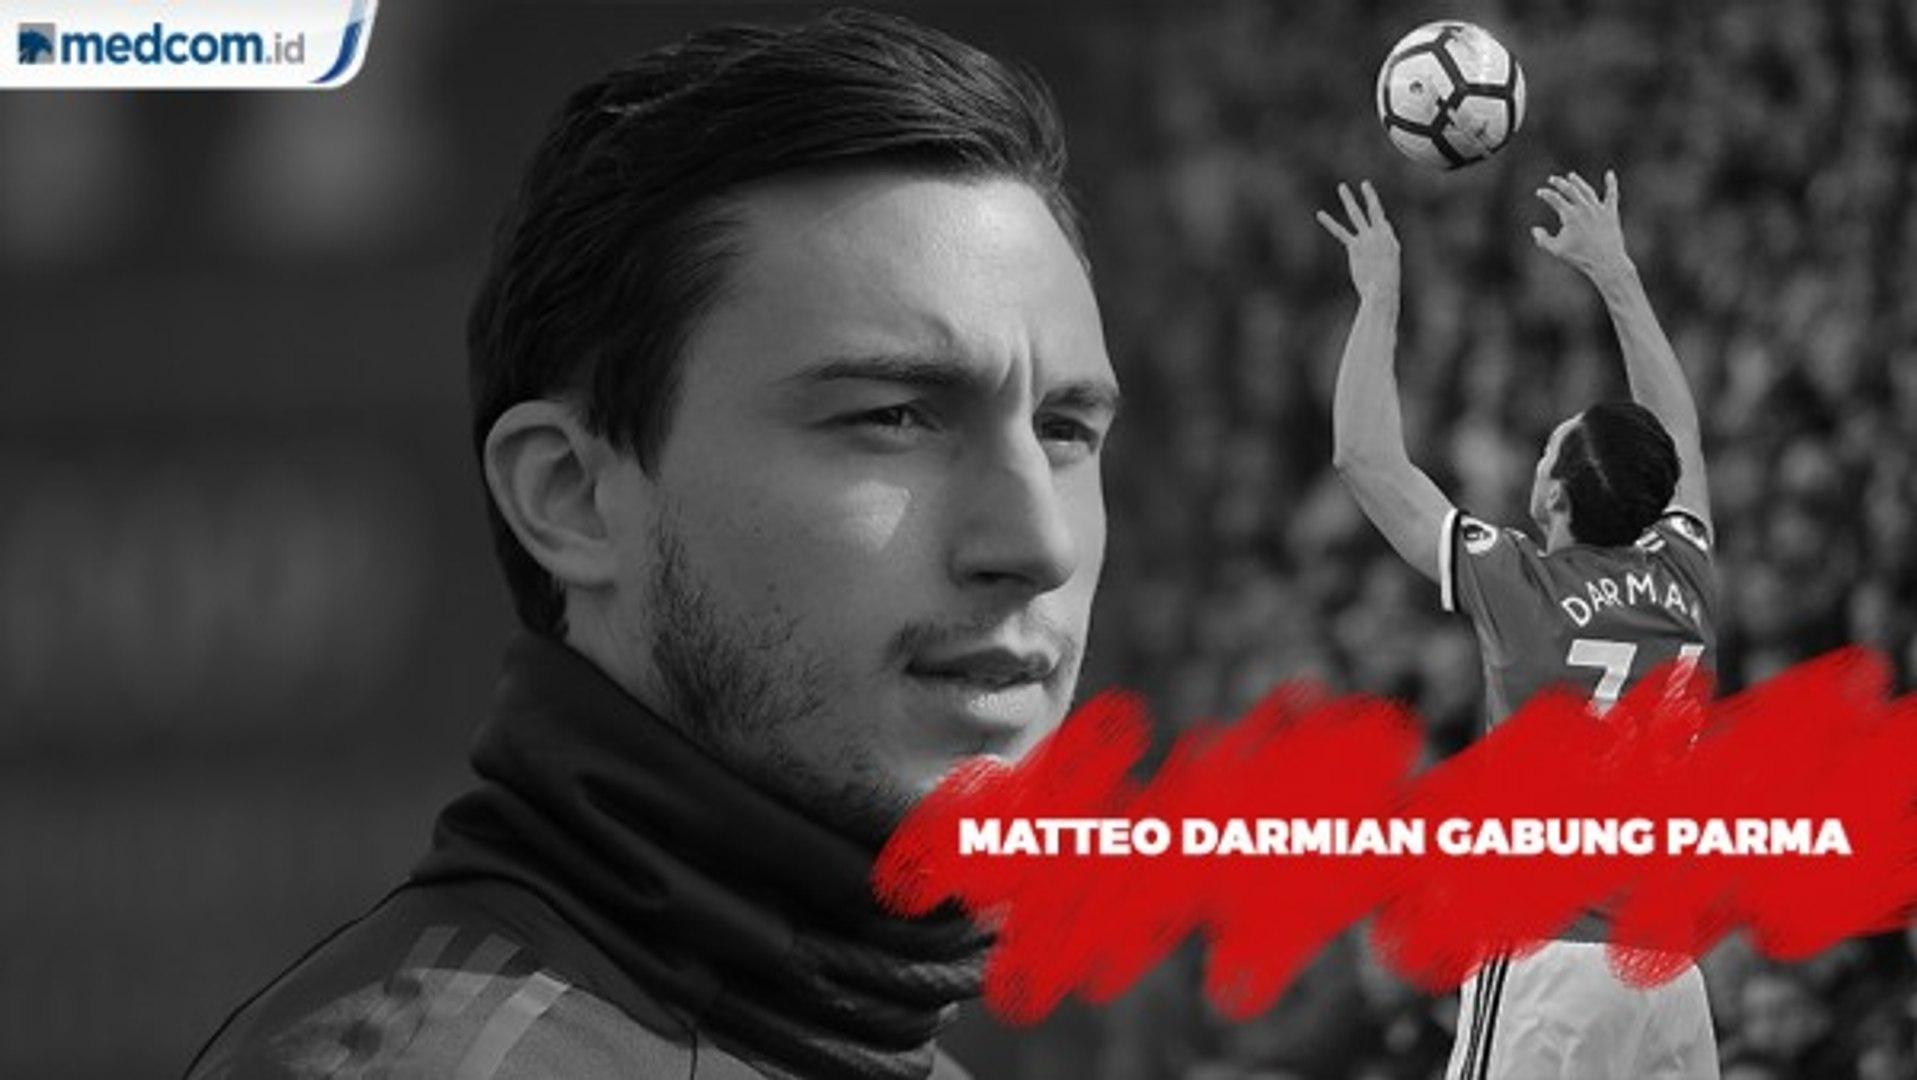 MU Resmi Lepas Matteo Darmian